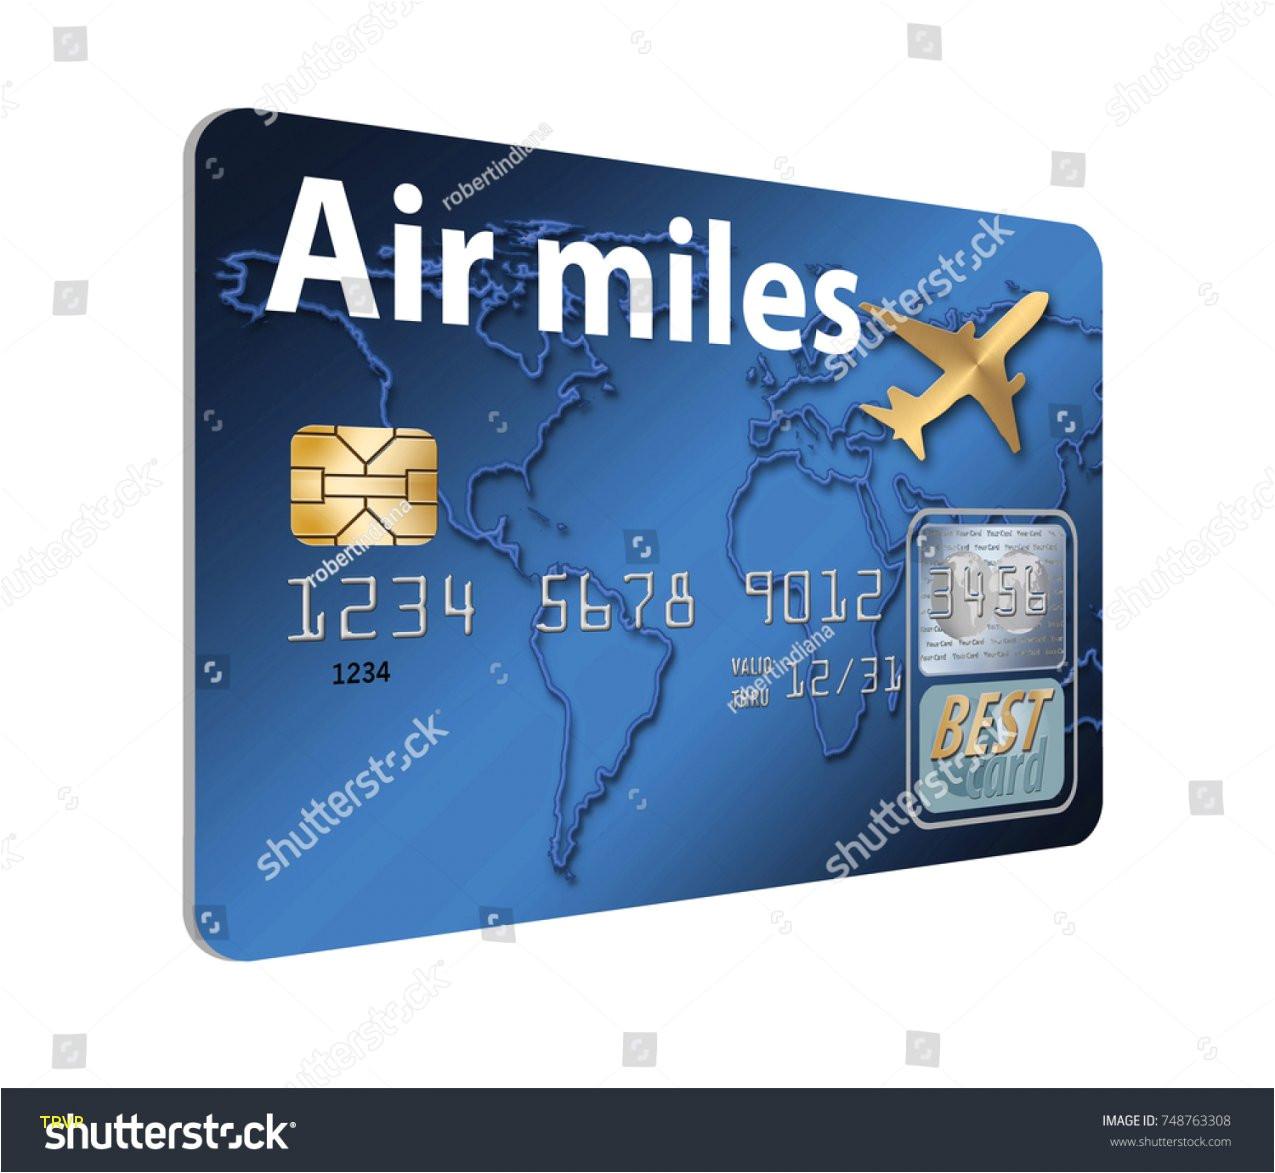 air miles credit card a credit card that provides air rewards and bonus miles